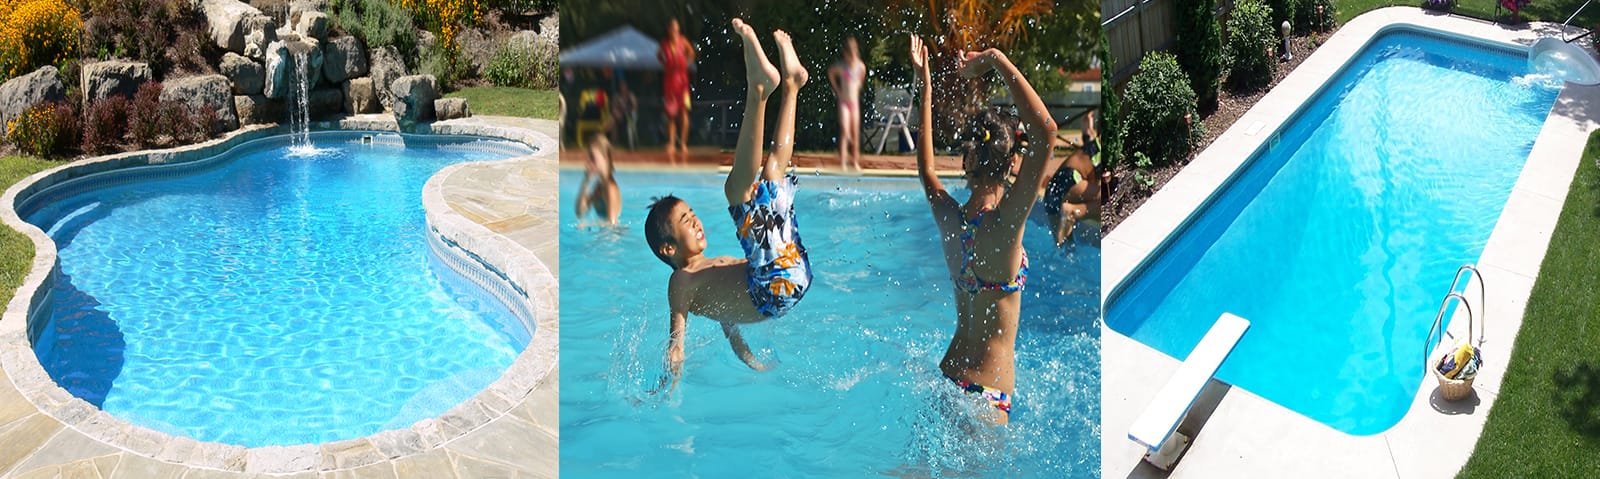 Swimming Pool Builder In Florida Swimming Pool Kit